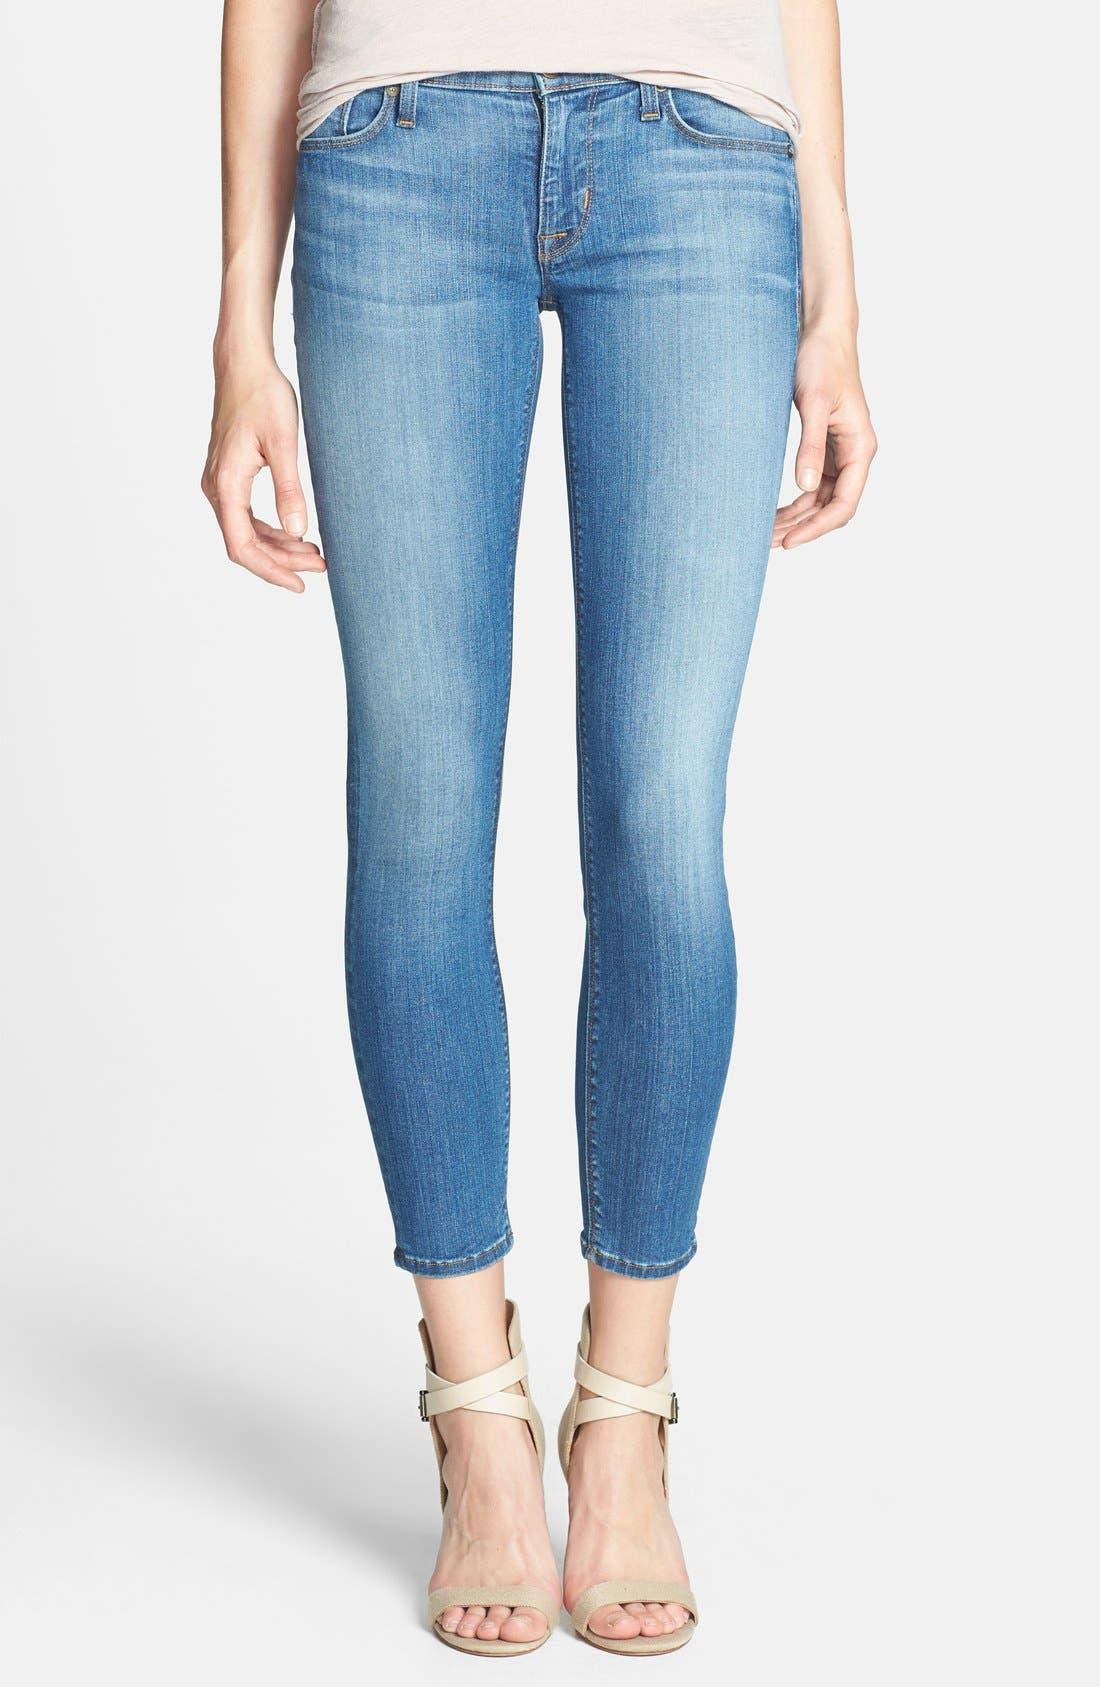 Alternate Image 1 Selected - Hudson Jeans 'Krista' Crop Super Skinny Jeans (Worship Me)